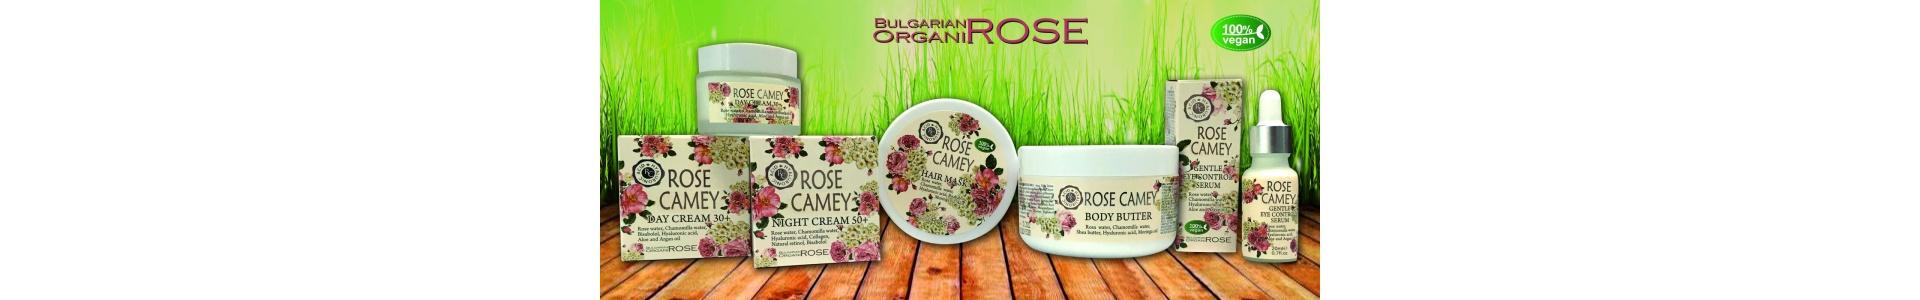 Rose Camey 100% VEGAN козметична серия |Bulgarian OrganiRose | Красота и здраве